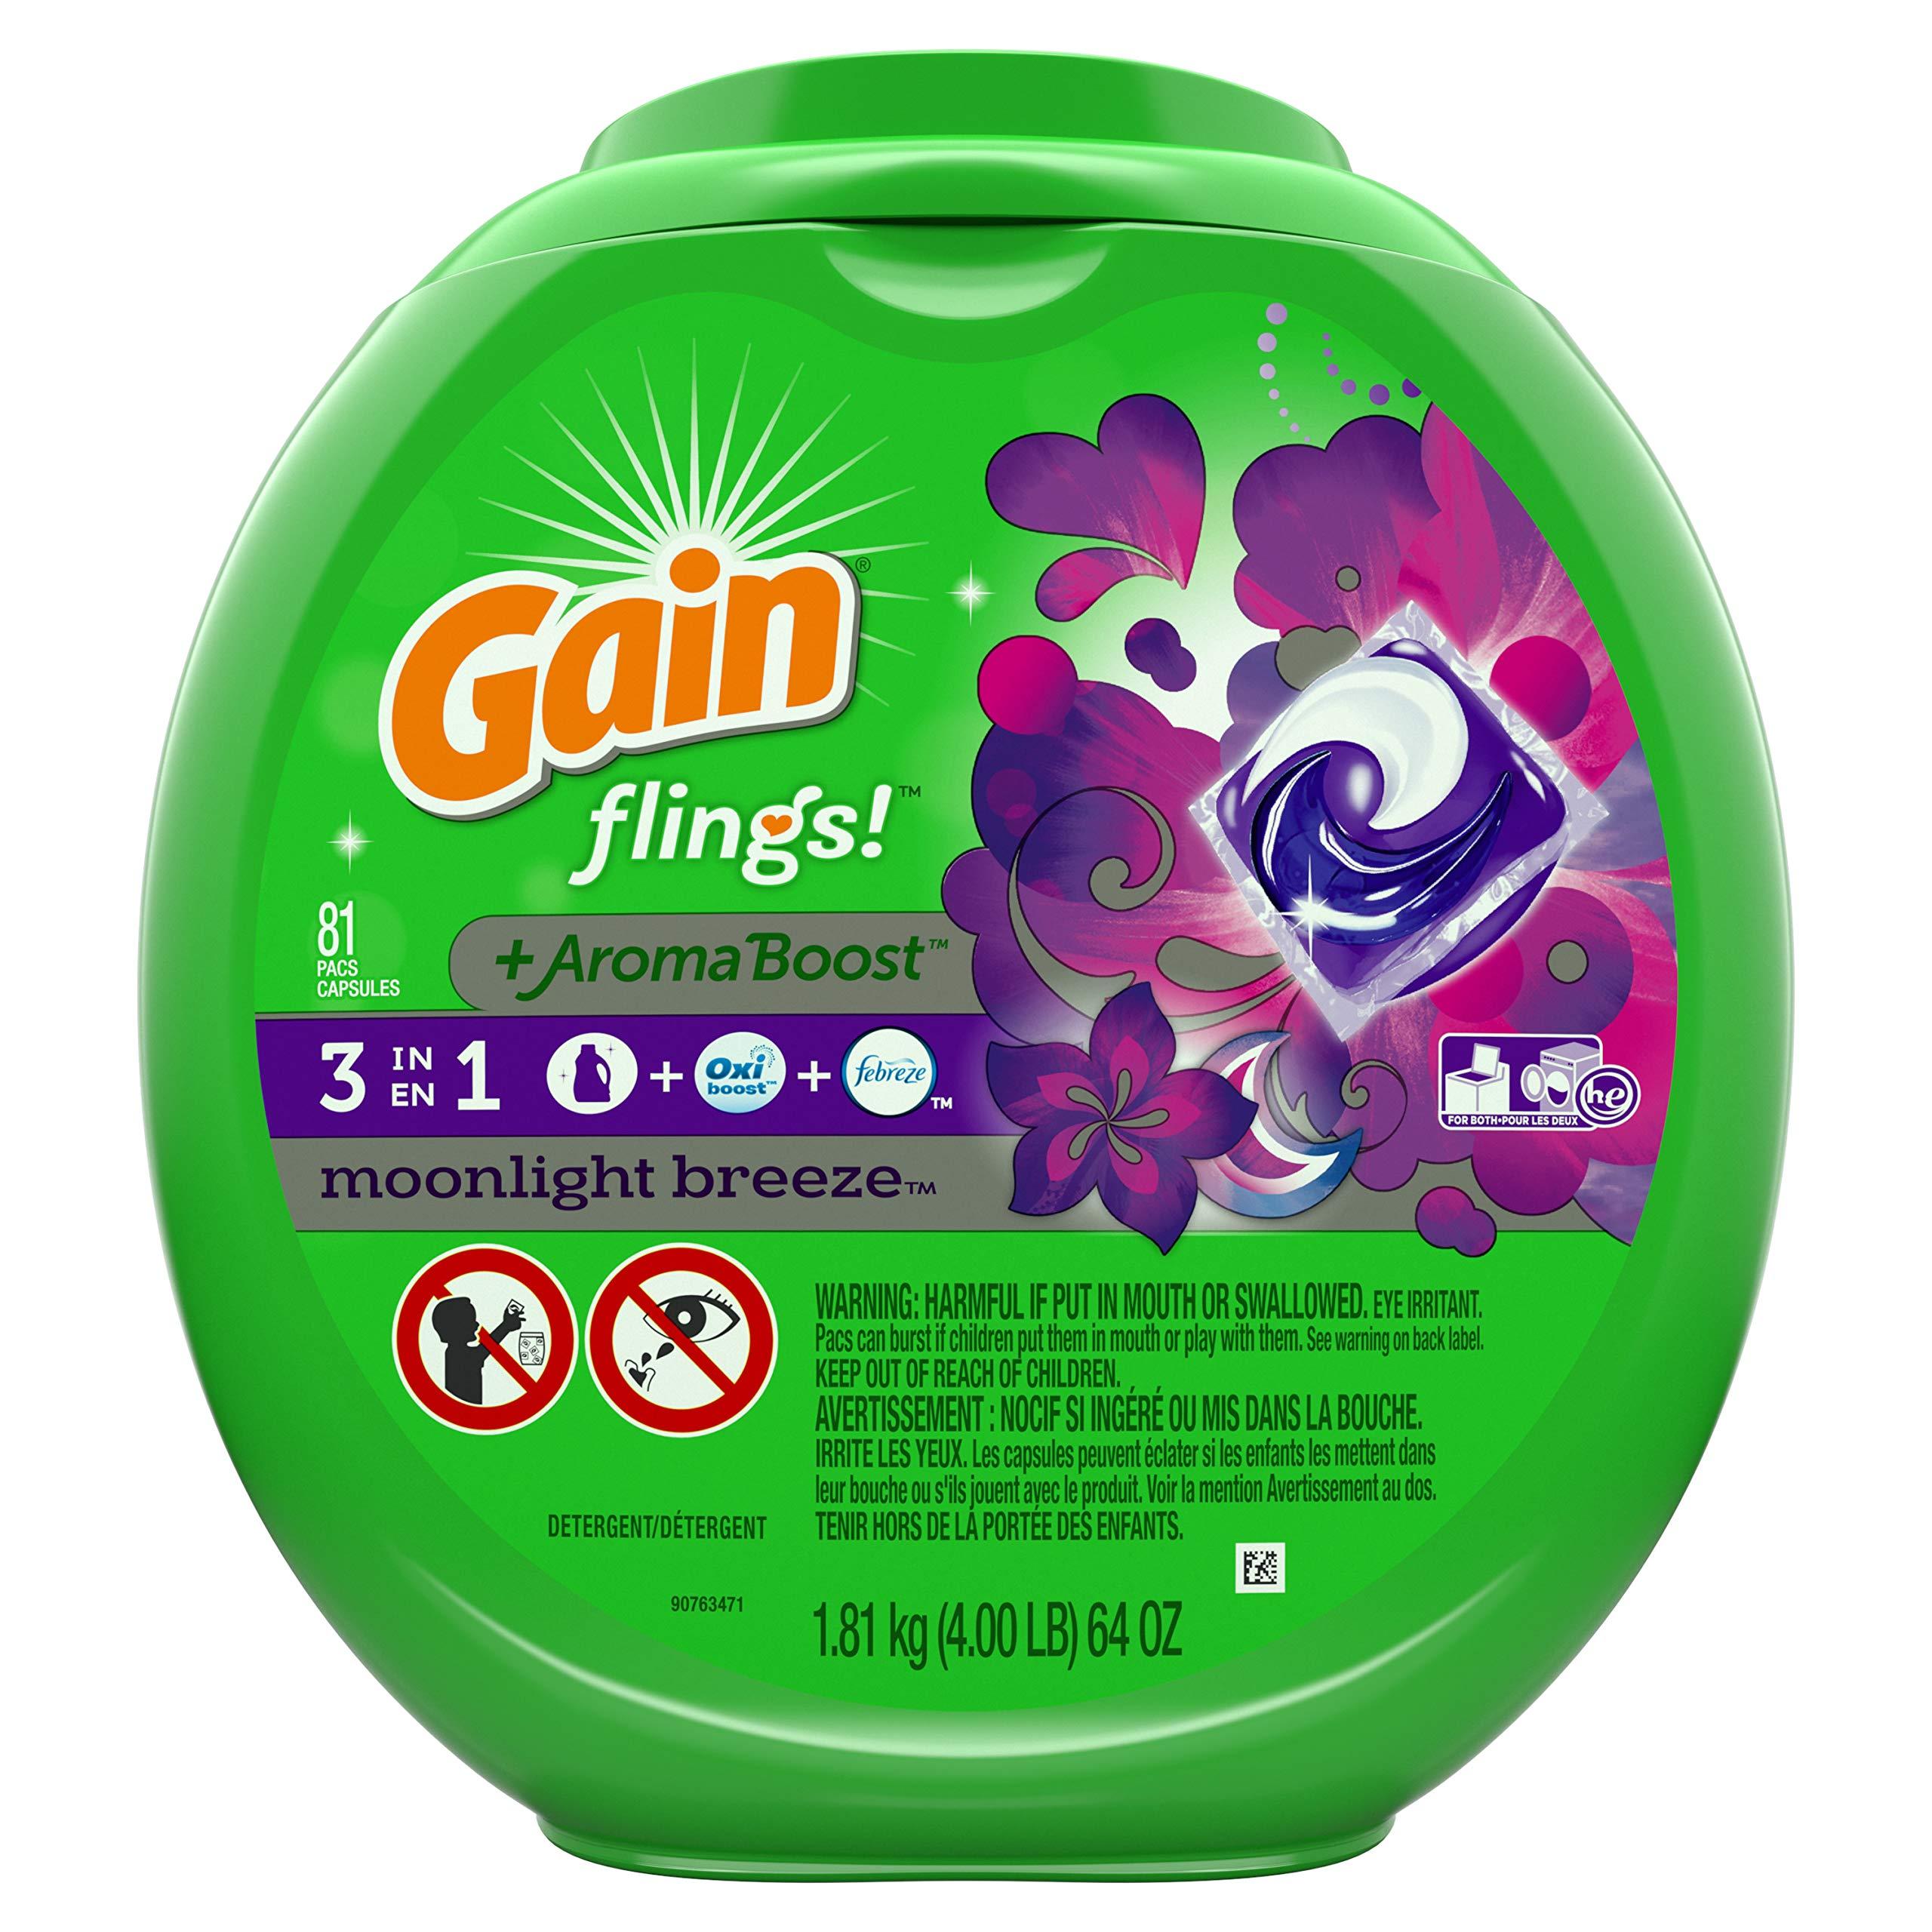 Gain Flings! +AromaBoost Laundry Detergent Pacs, Moonlight Breeze, 81 Count